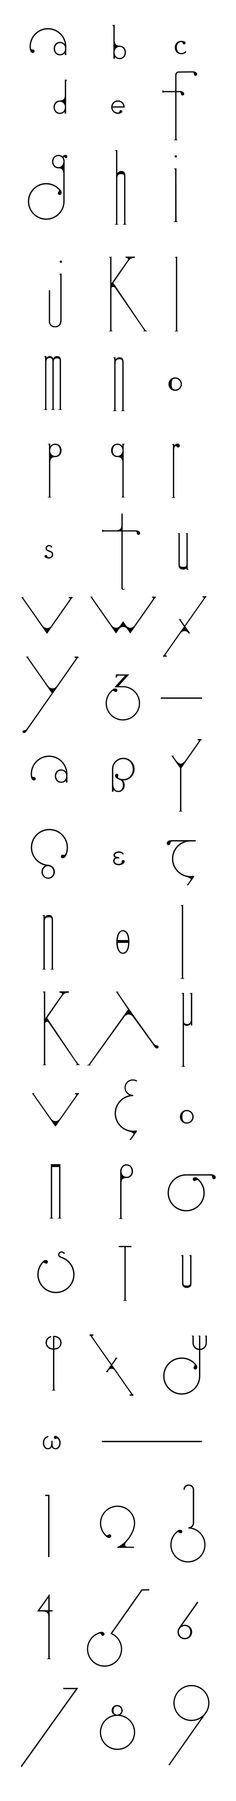 futuracha the font by odysseas gp.